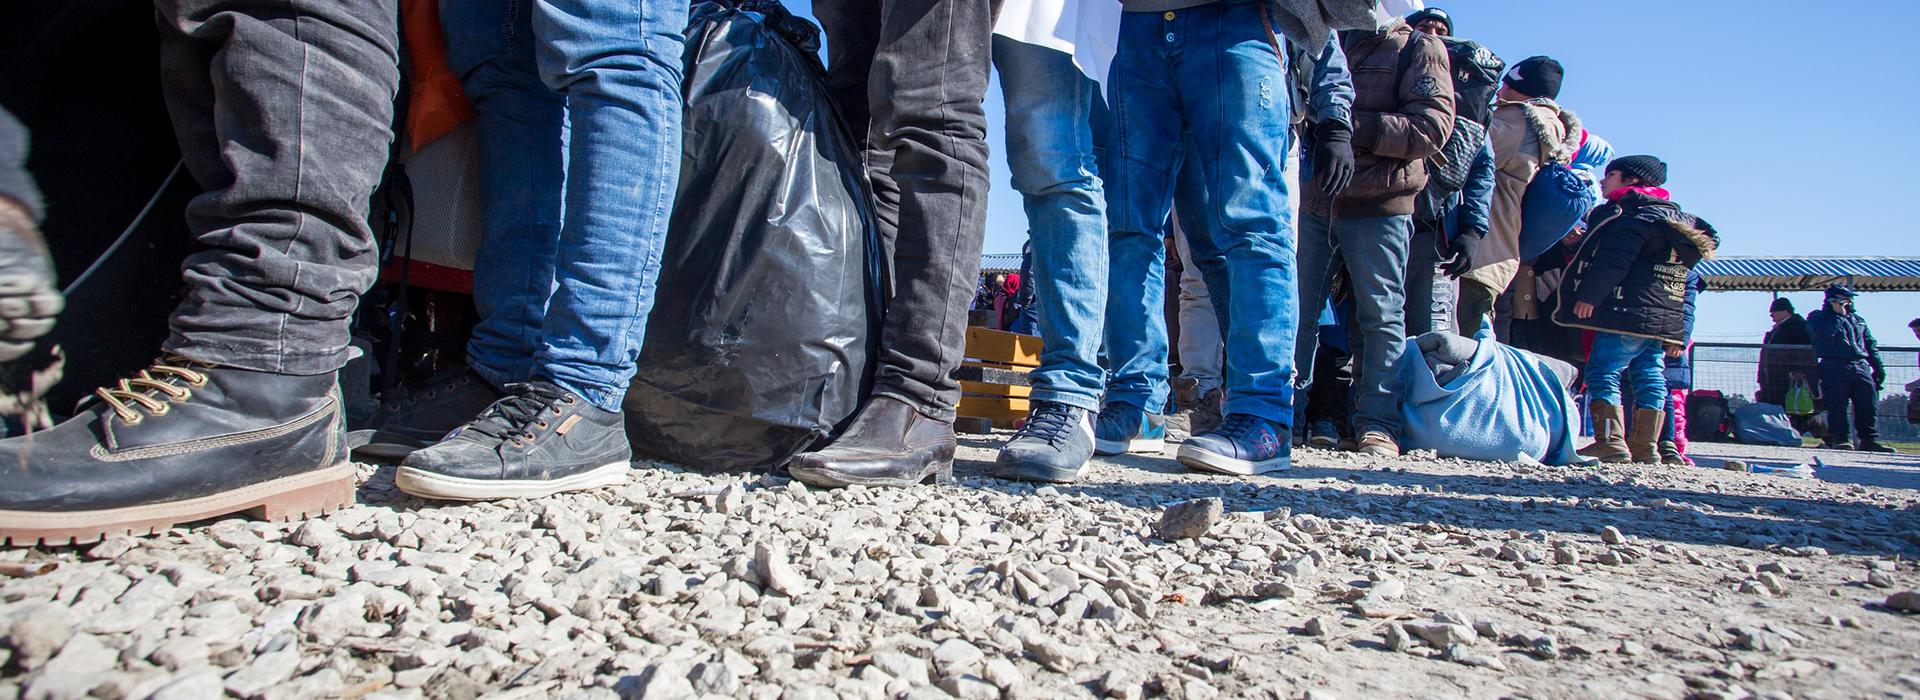 Vluchteling in Gouda, zaterdag 29 oktober 2016